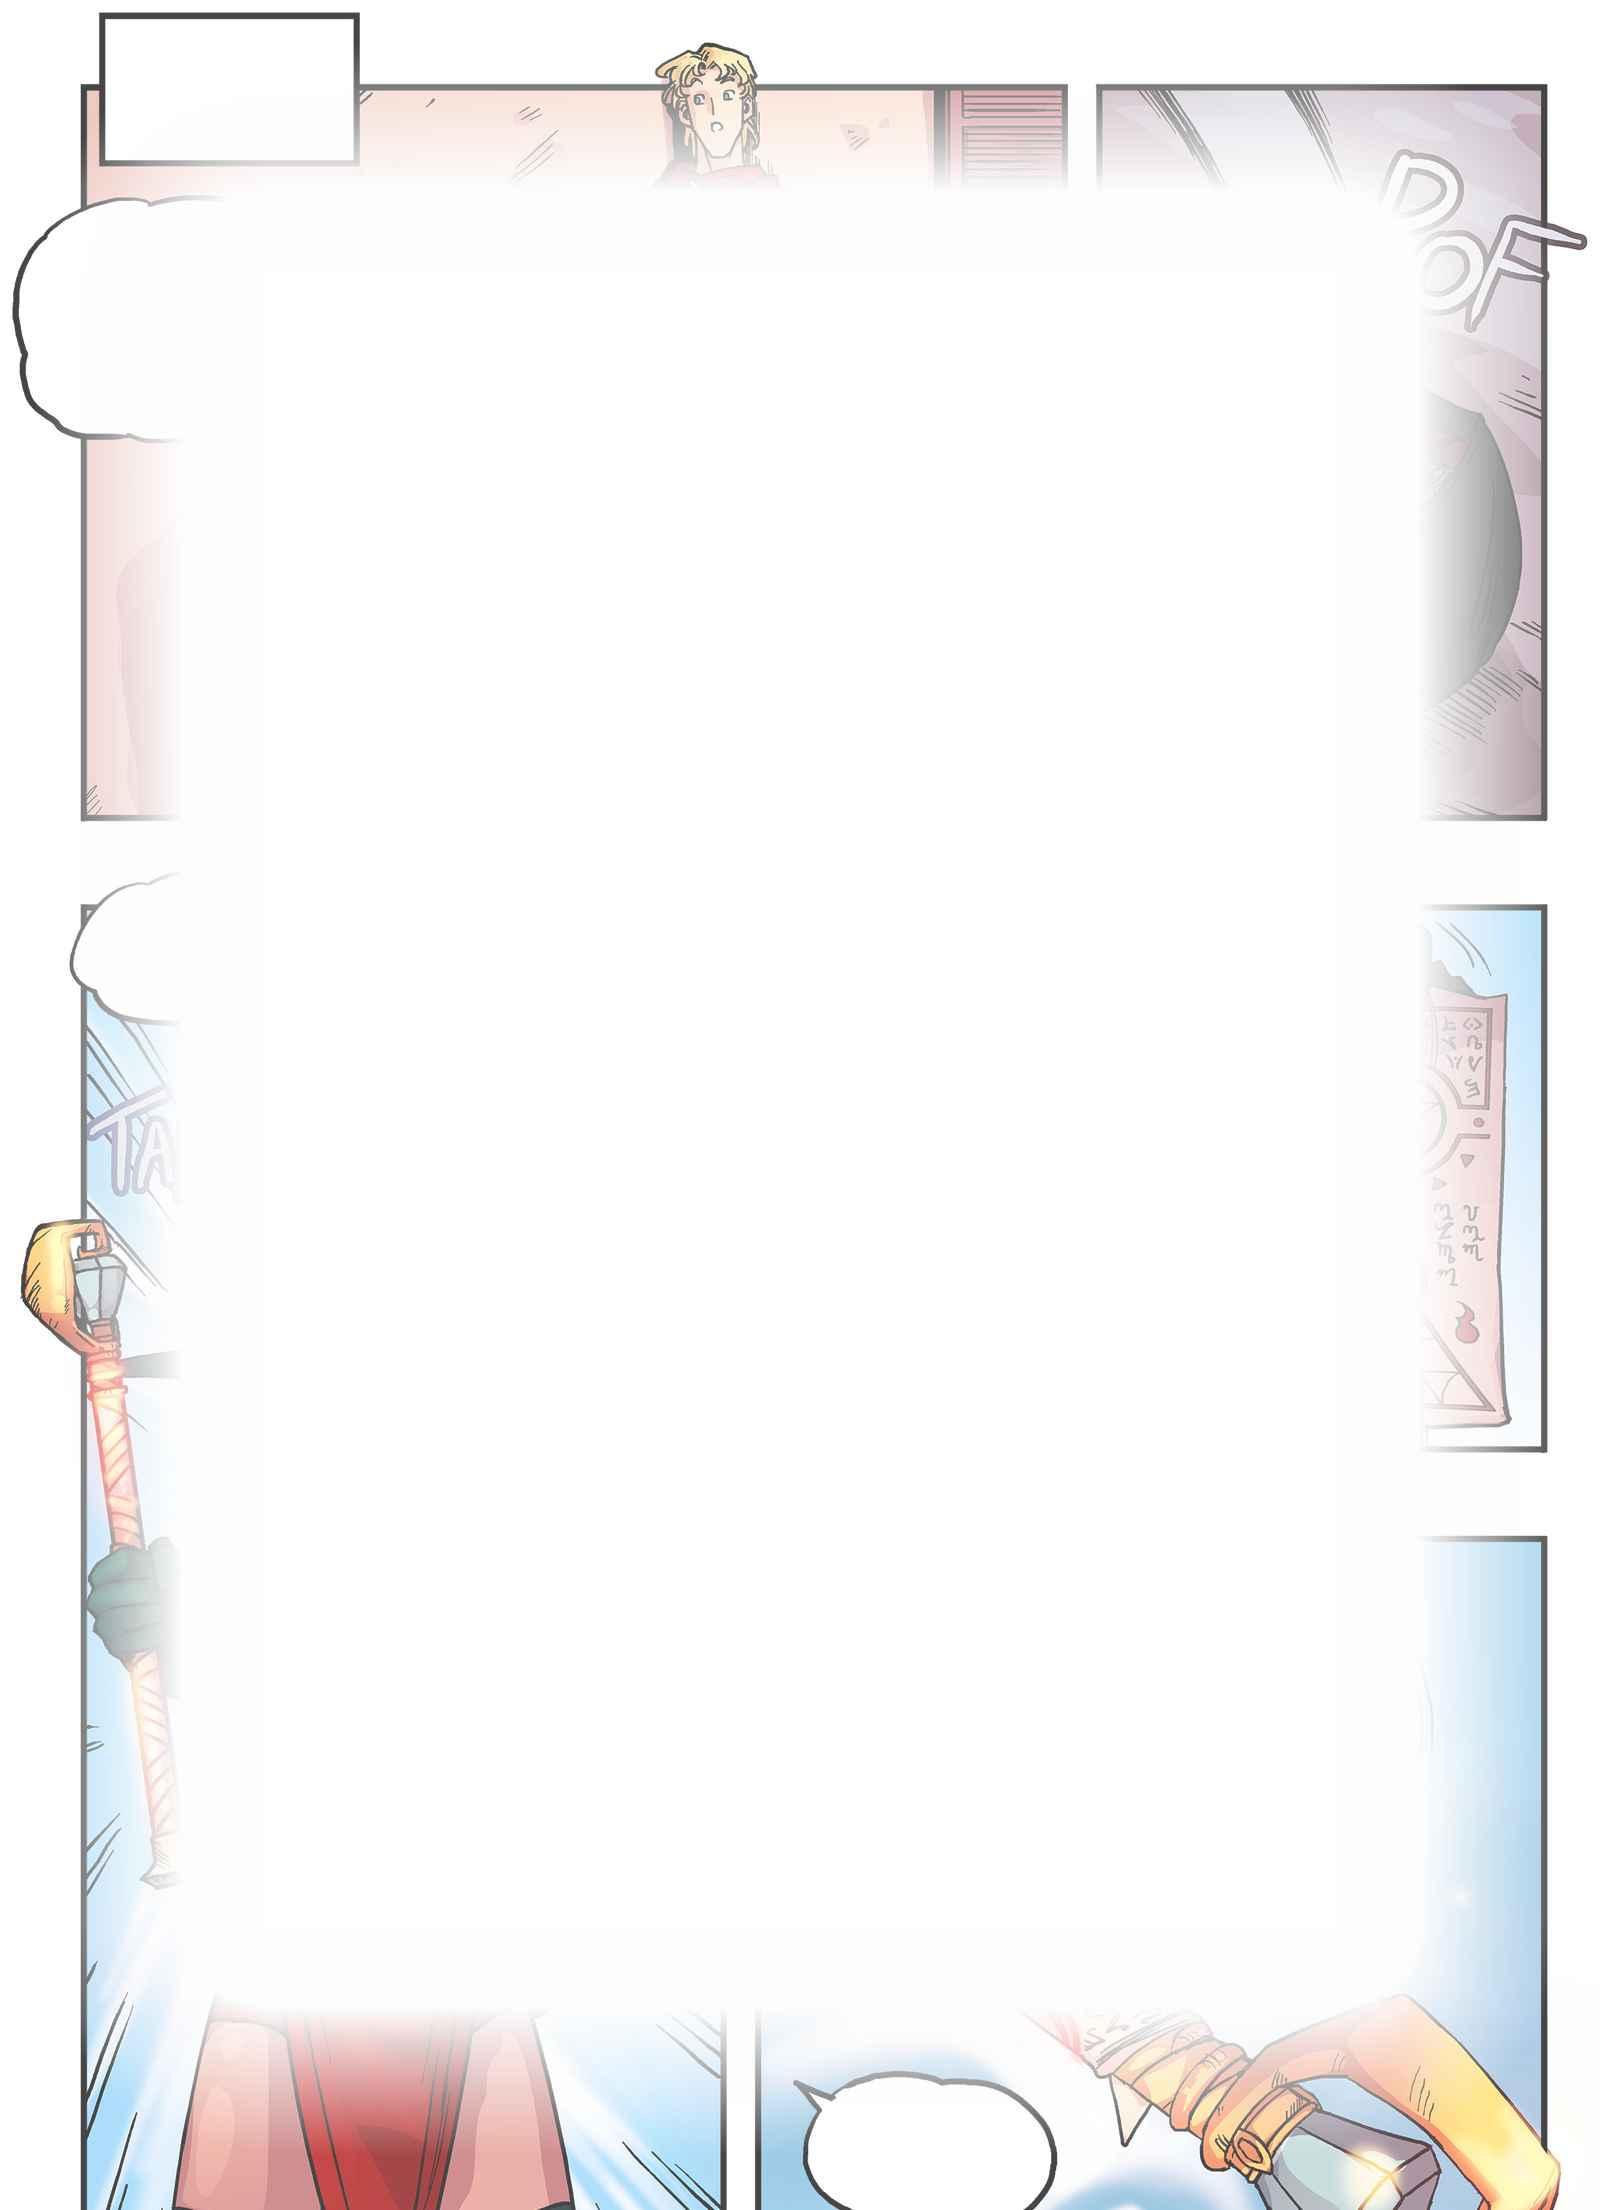 Hémisphères : Глава 6 страница 3